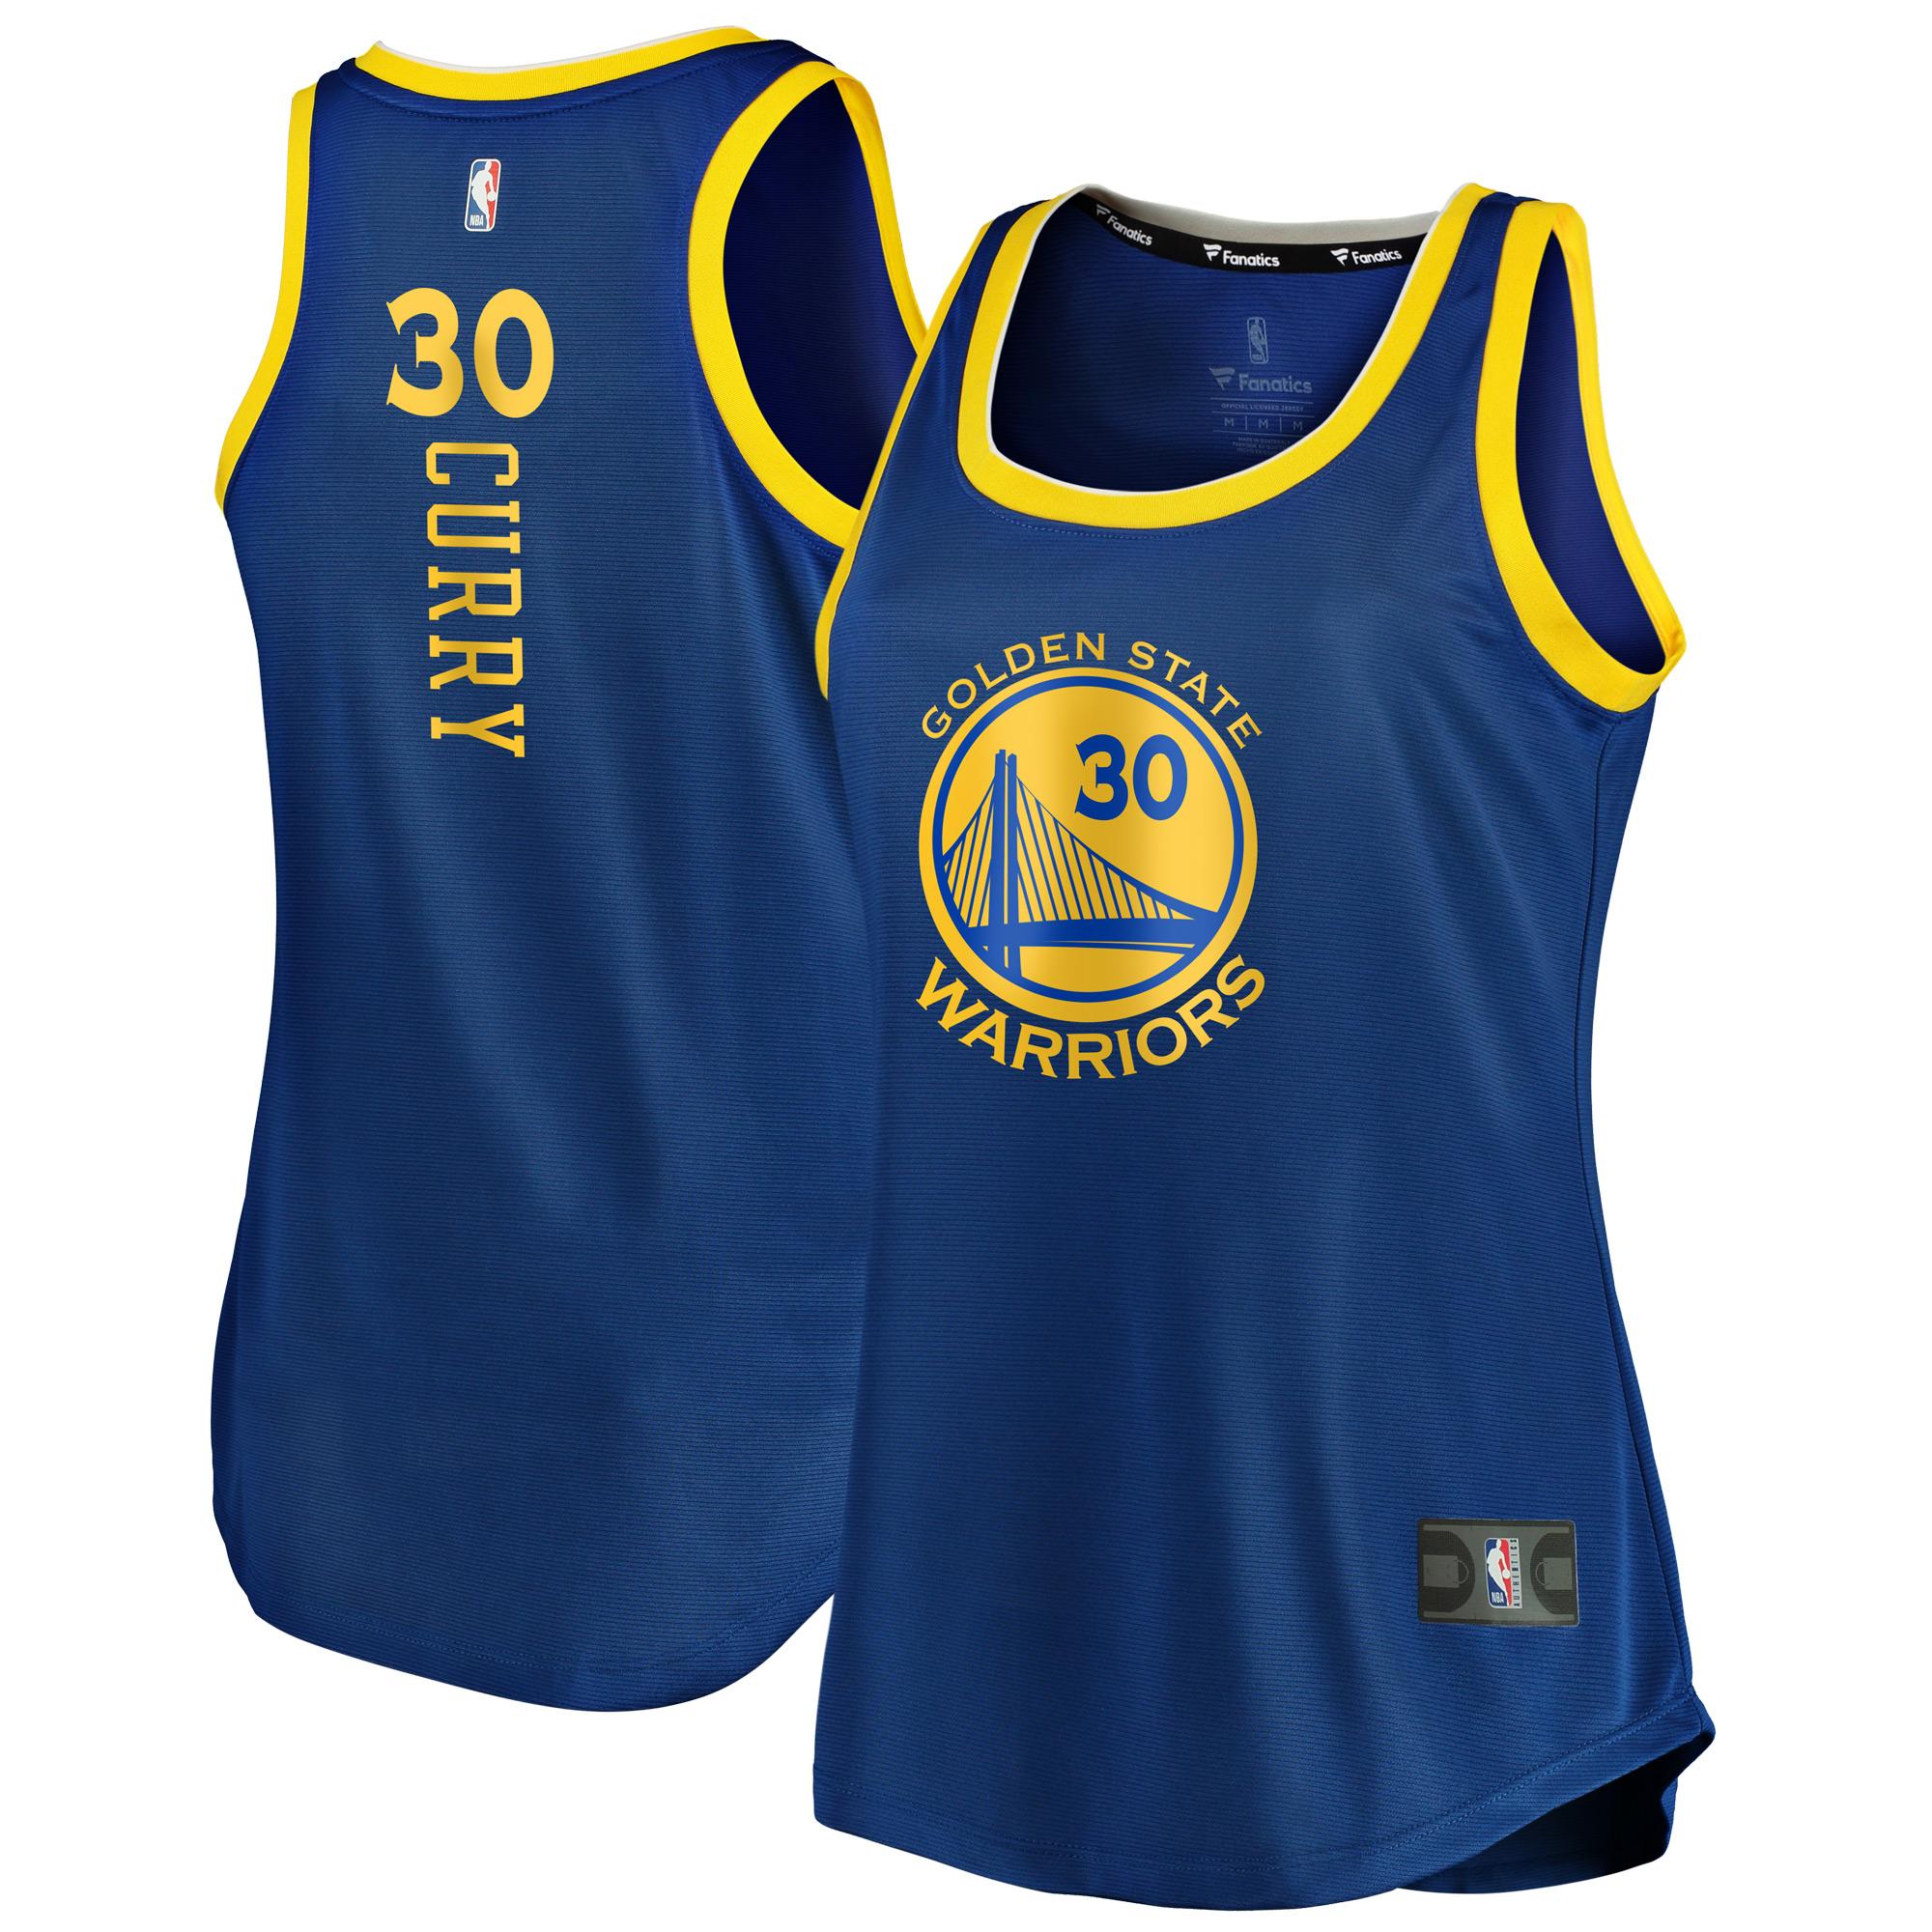 Stephen Curry Golden State Warriors Fanatics Branded Women's Fast Break Tank Jersey - Icon Edition - Royal